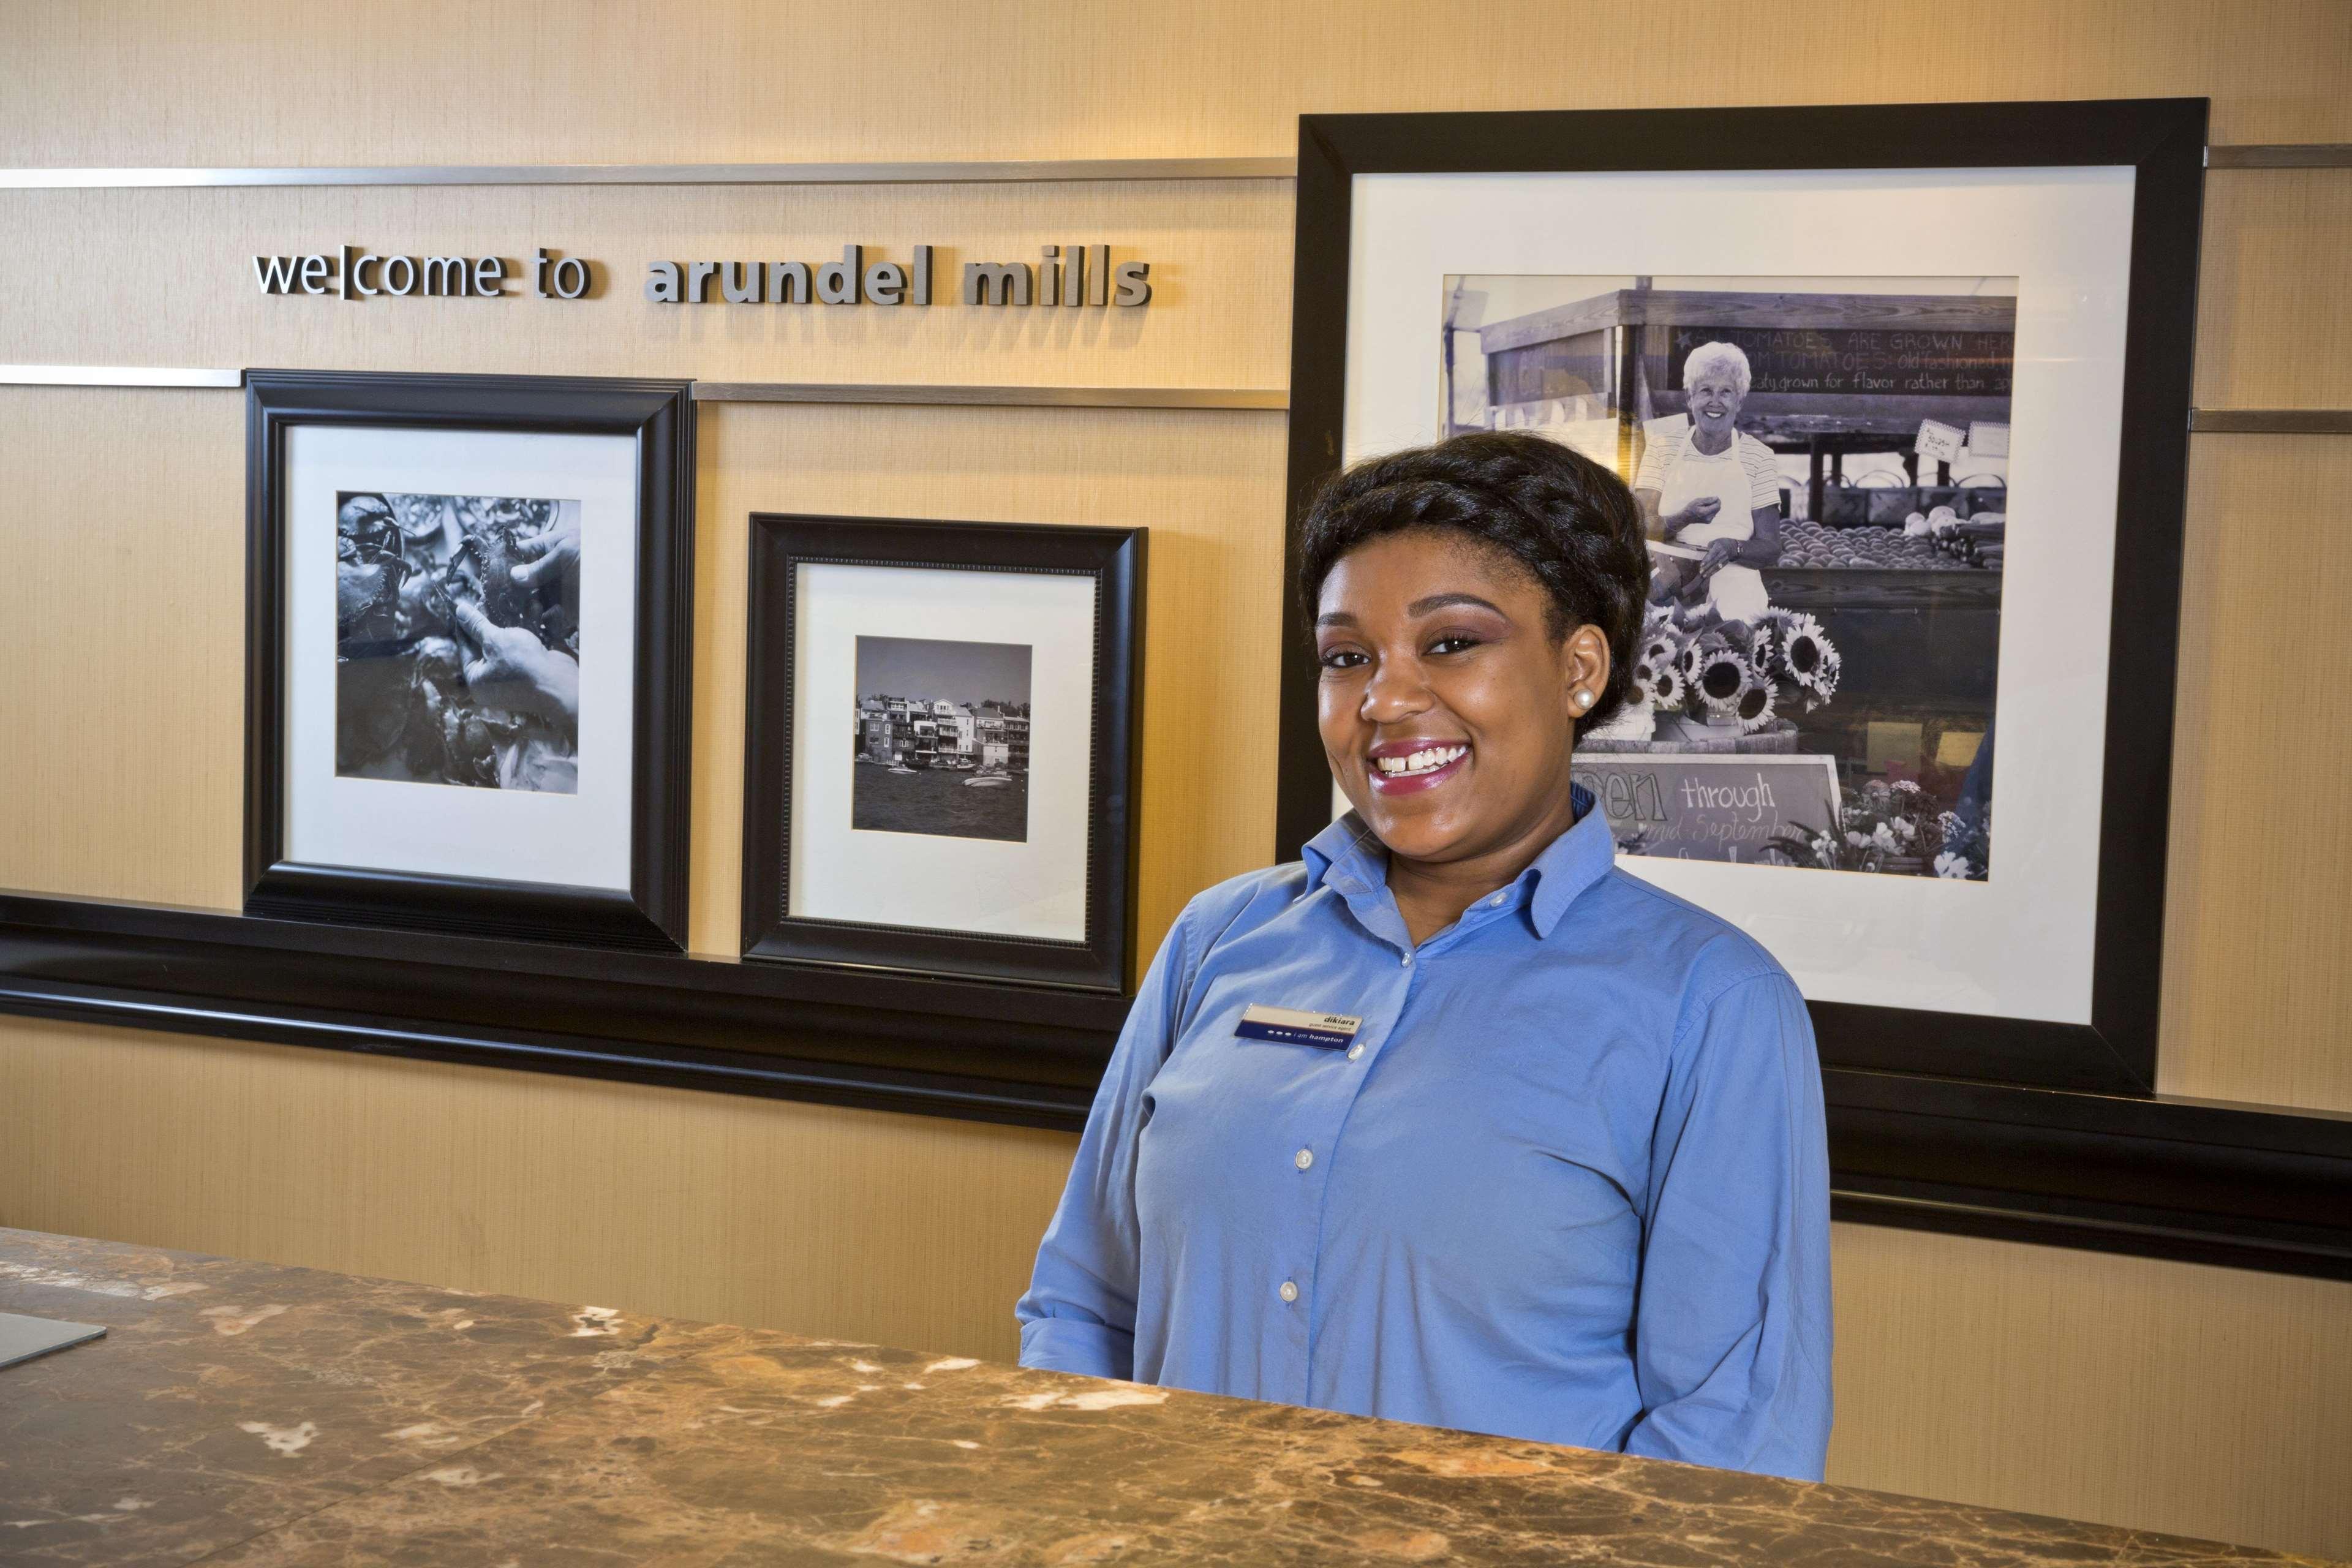 Hampton Inn & Suites Arundel Mills/Baltimore image 2